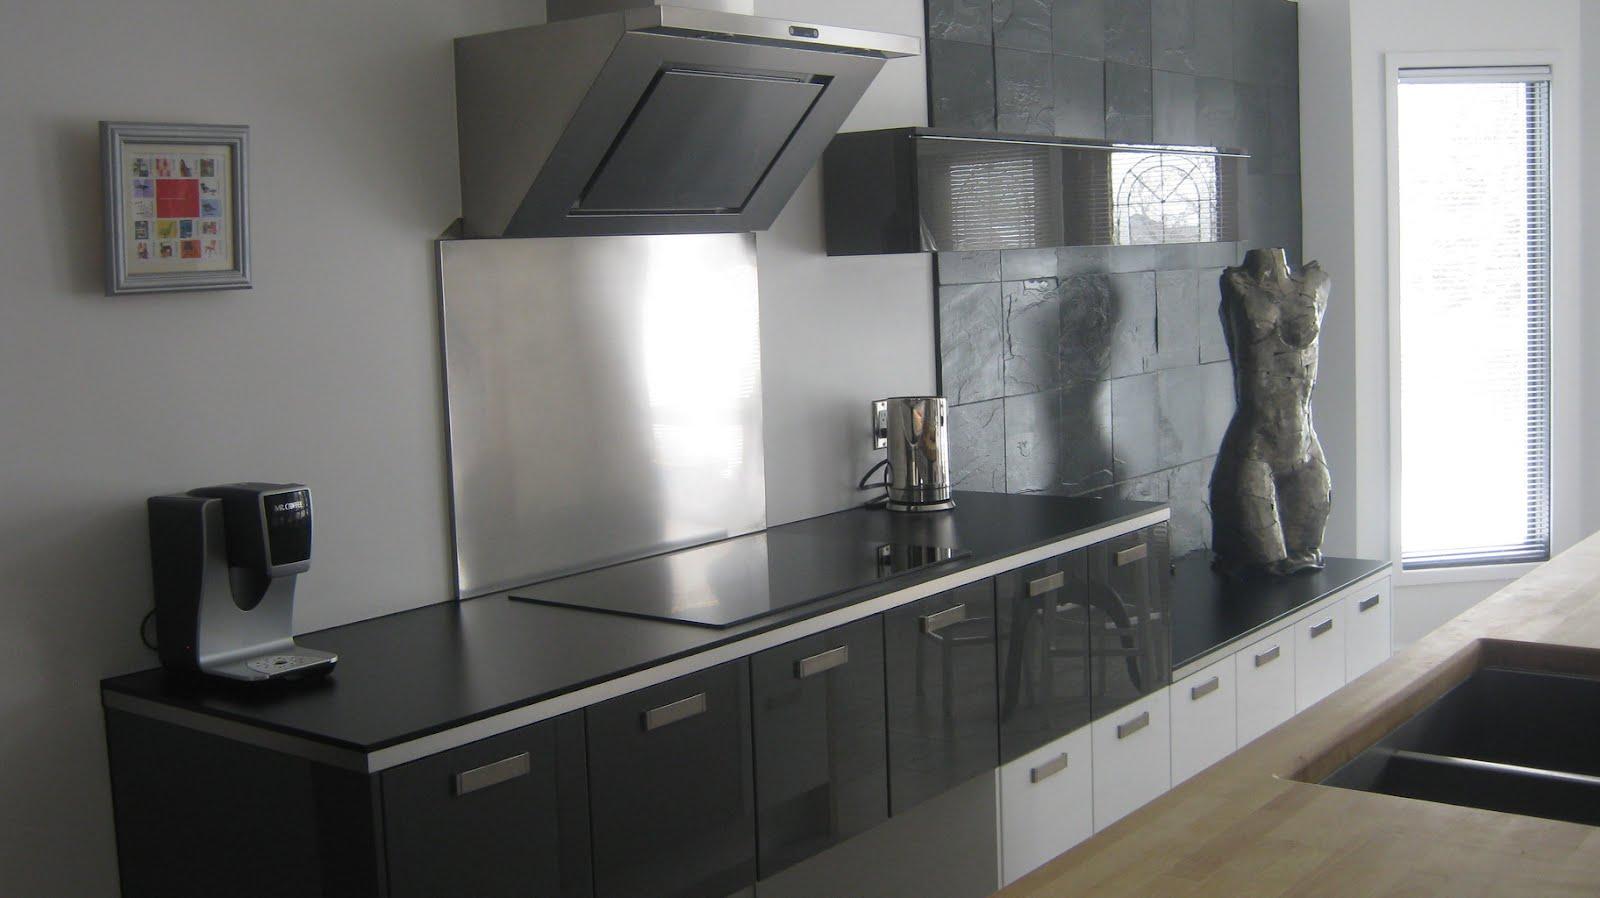 ikea stainless steel backsplash stainless steel kitchen backsplash Grey Ikea Stainless Steel Backsplash With Wooden Kitchen Island